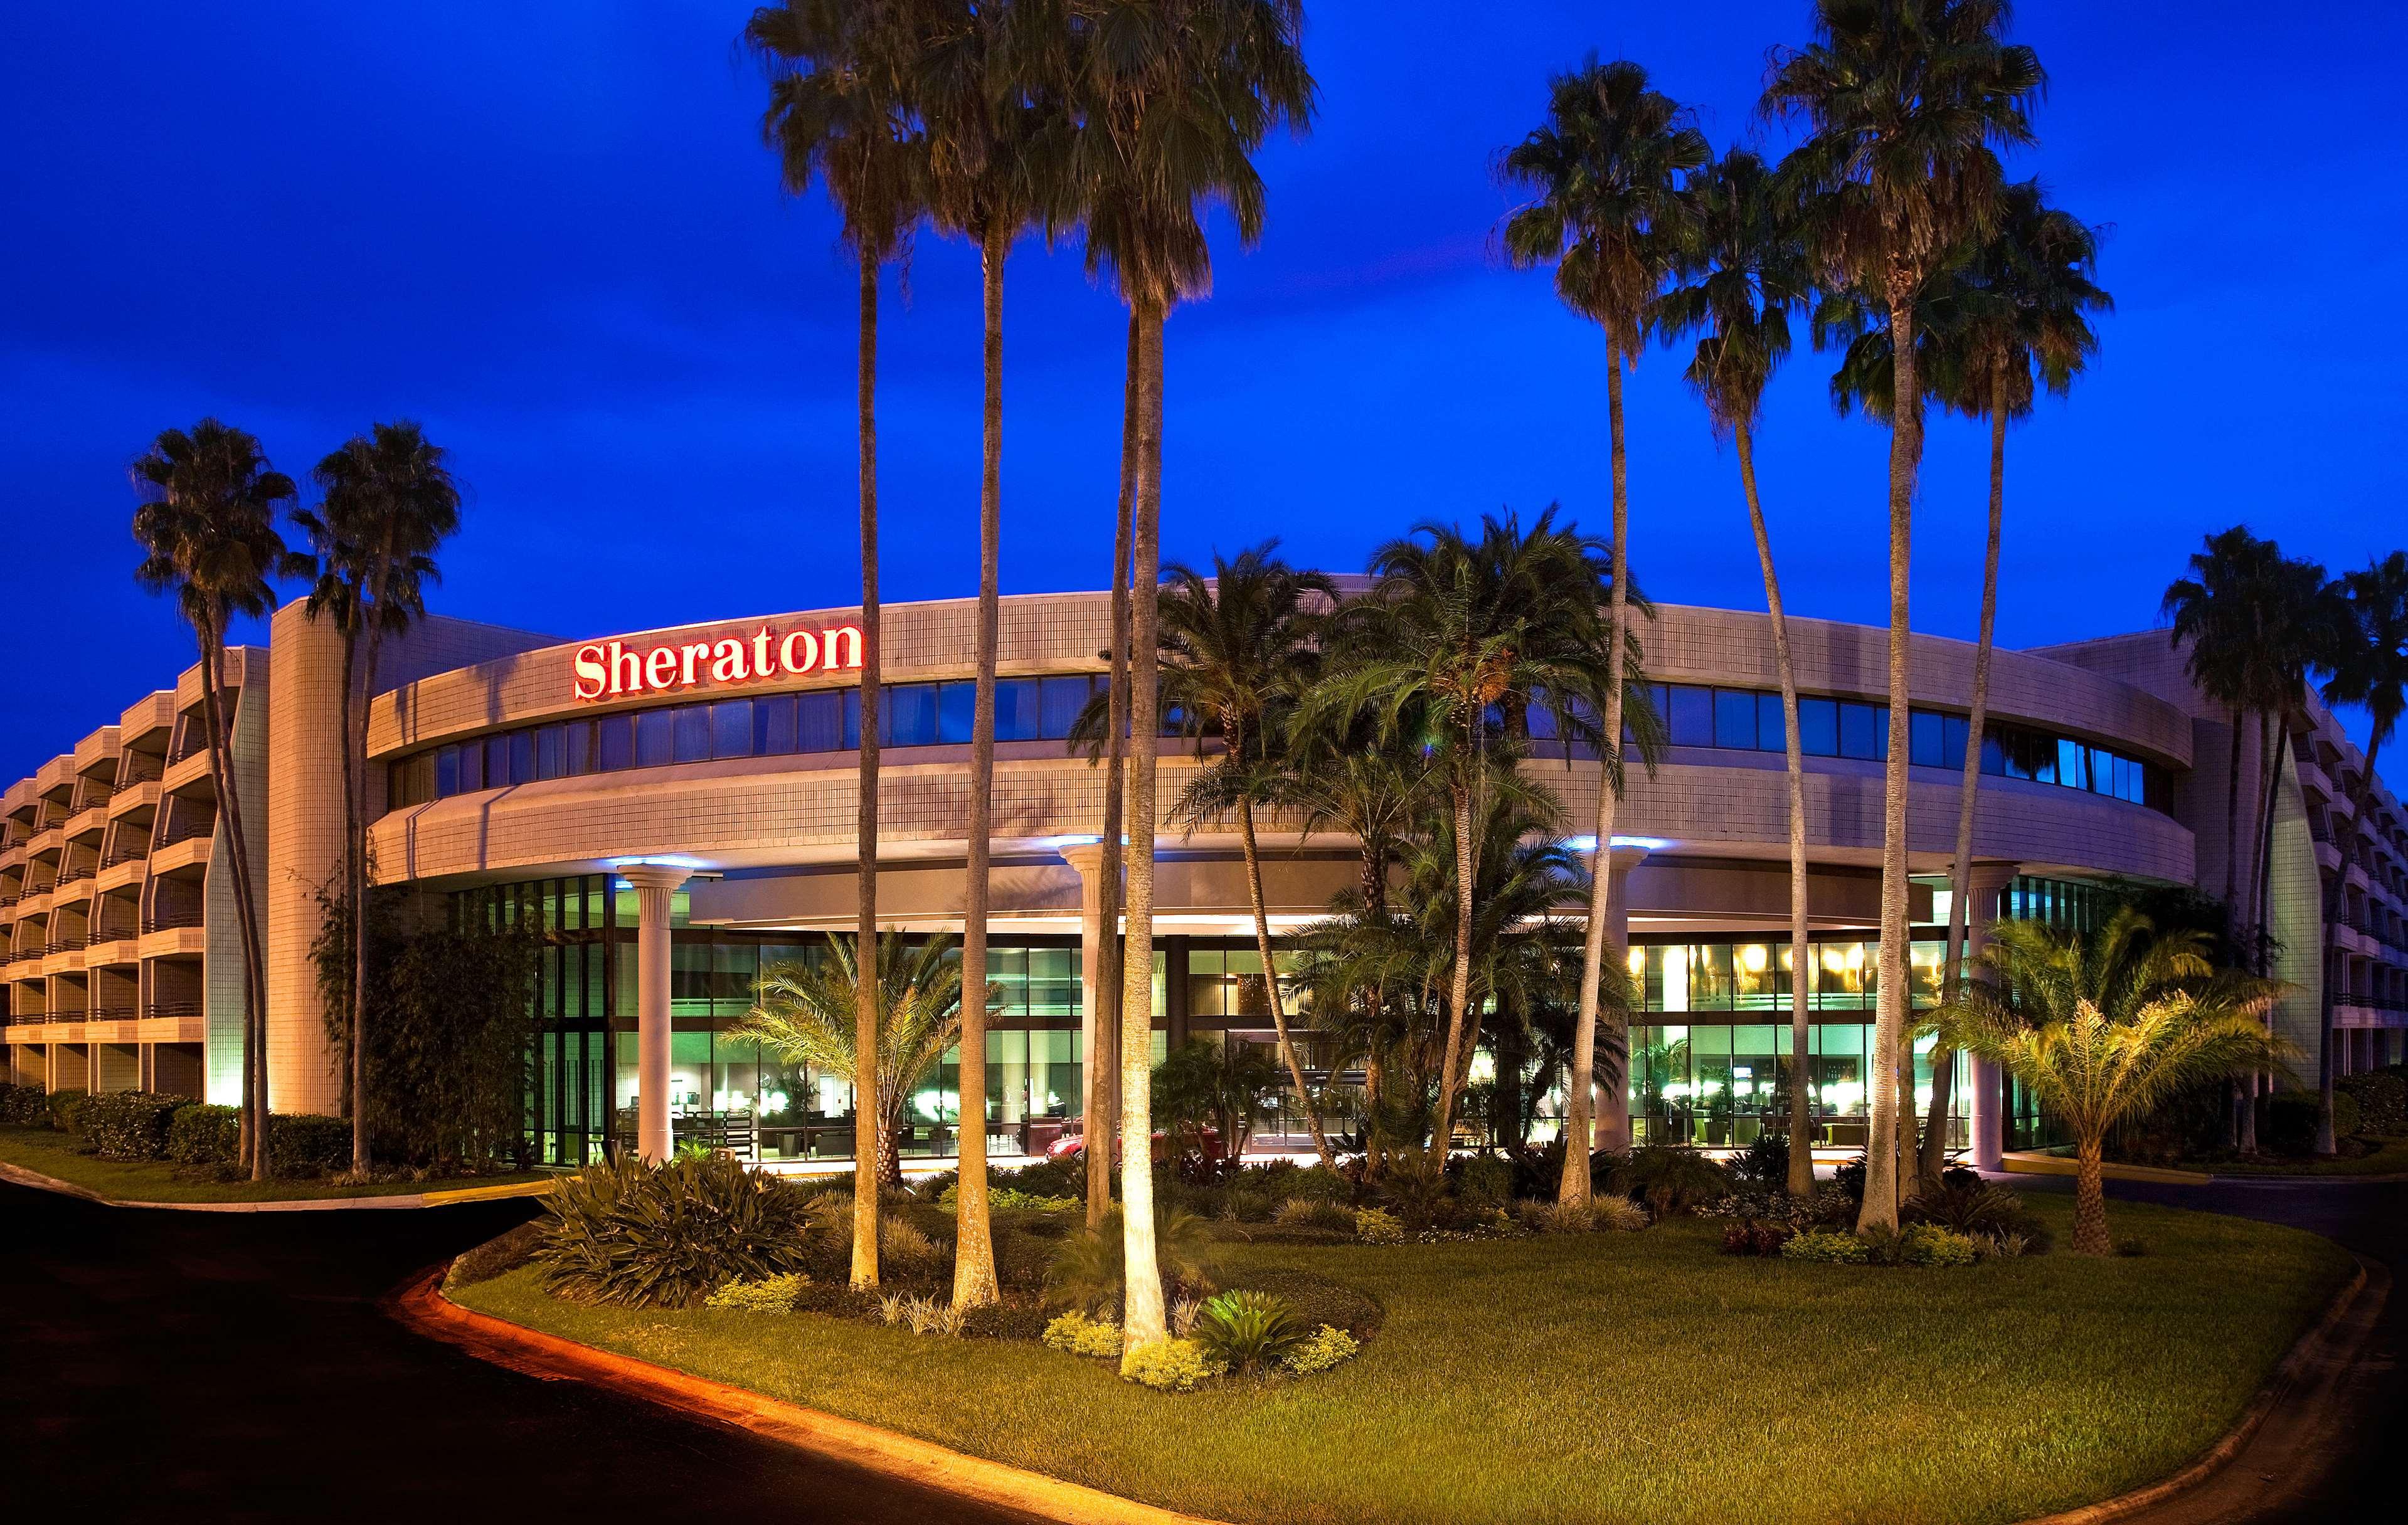 Sheraton Tampa Brandon Hotel image 0